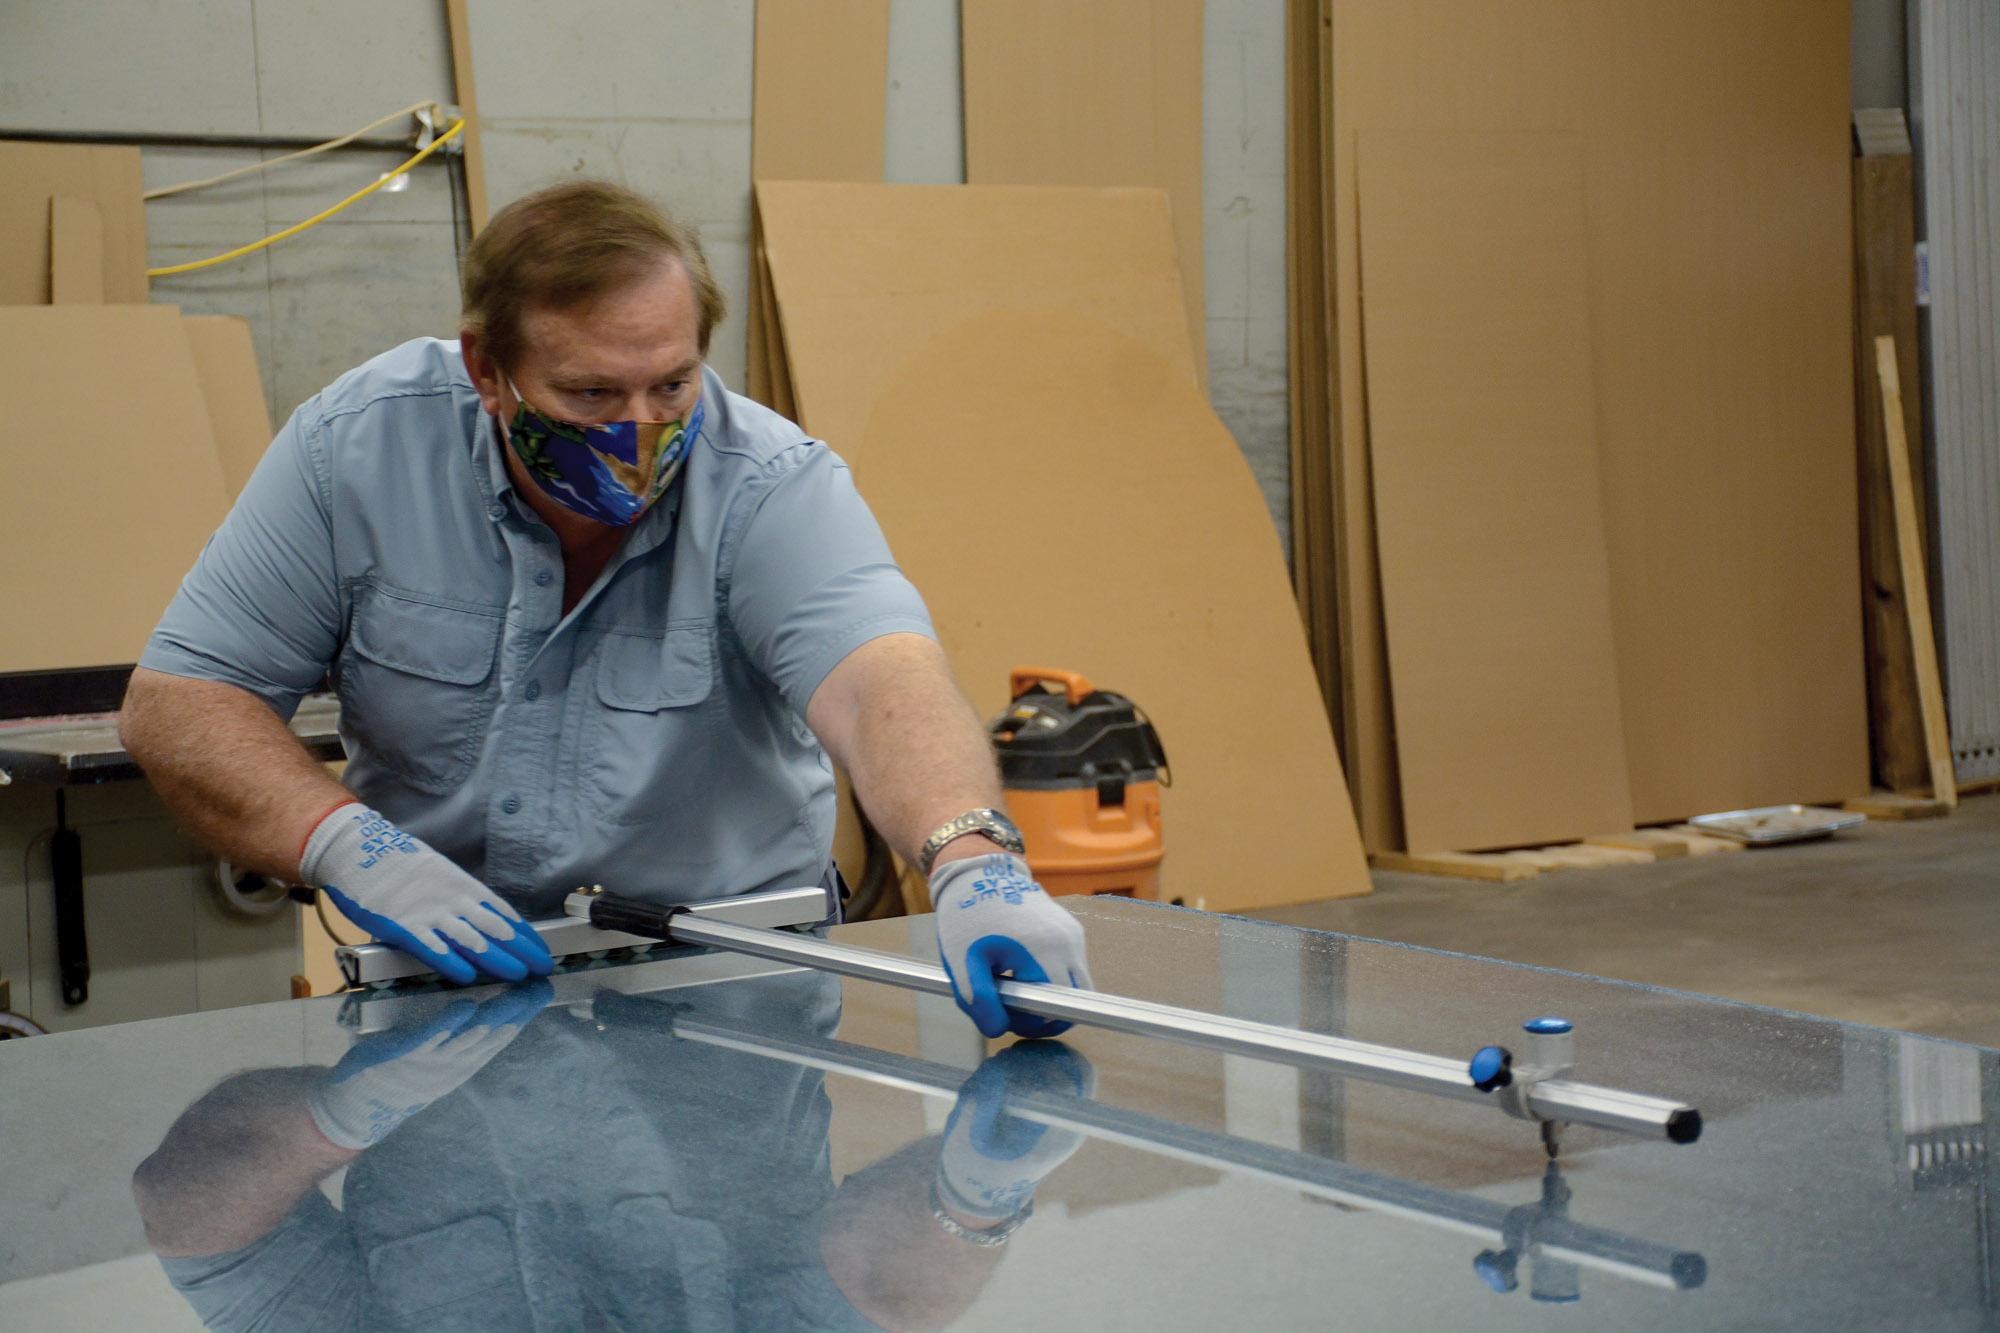 David Degling uses glasscutter